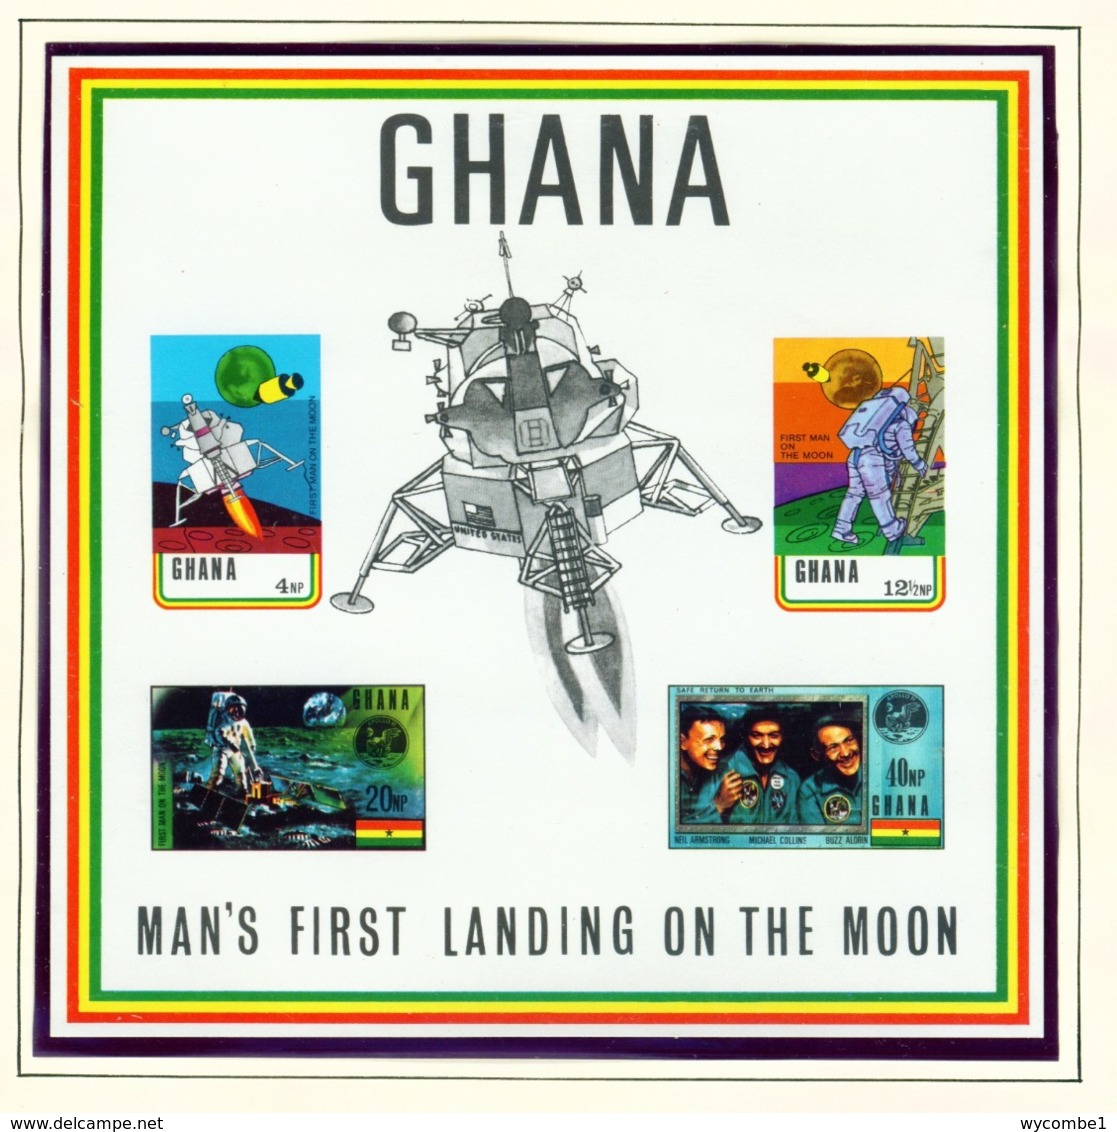 GHANA  -  1970 Moon Landing Miniature Sheet Imperf Unmounted/Never Hinged Mint - Ghana (1957-...)